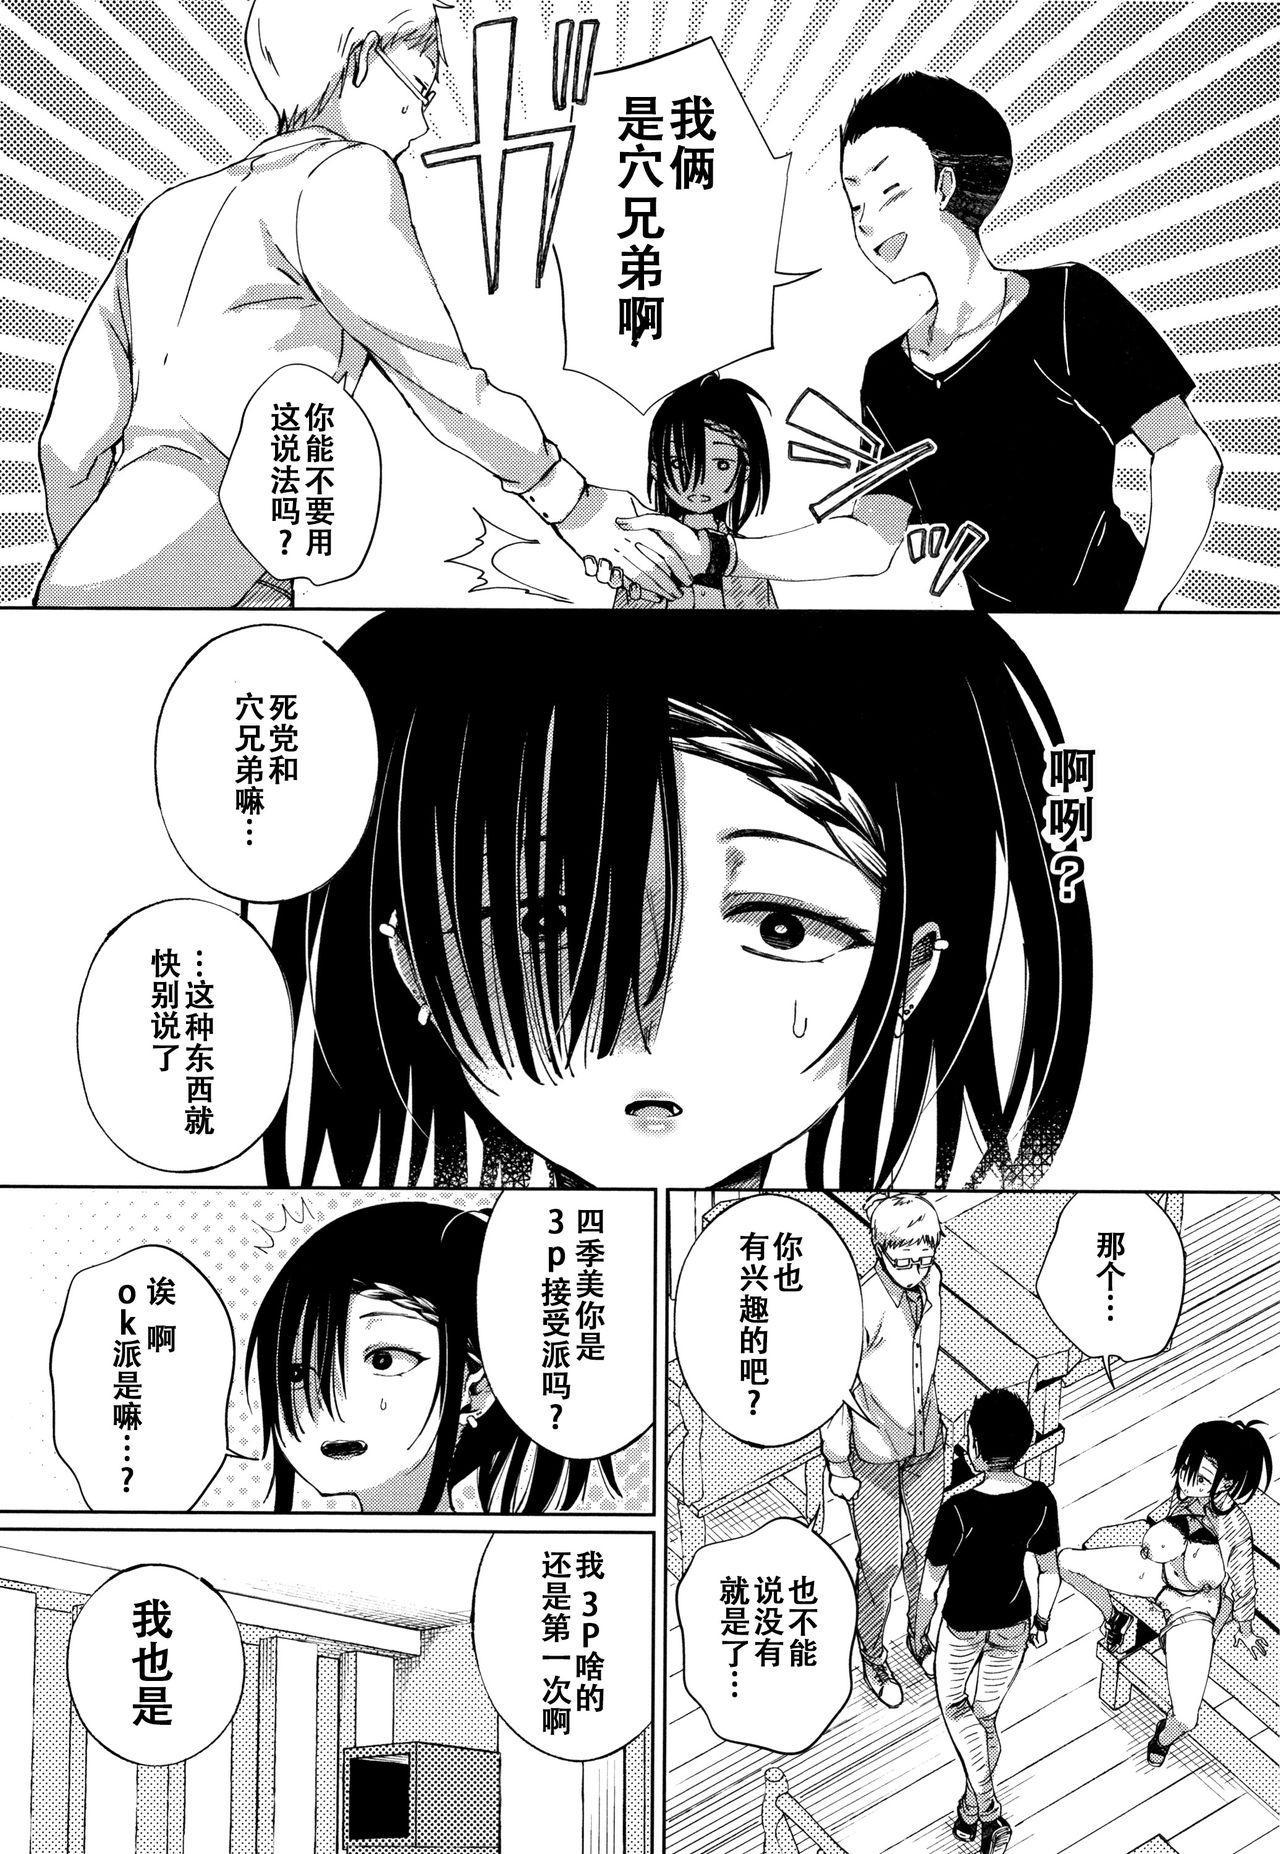 [Achumuchi] Saijaku Gal wa Ikizurai! - The weakest pussy is hard to go.ch.1-8 [Chinese] [战栗的玻璃棒汉化] [Ongoing] 32